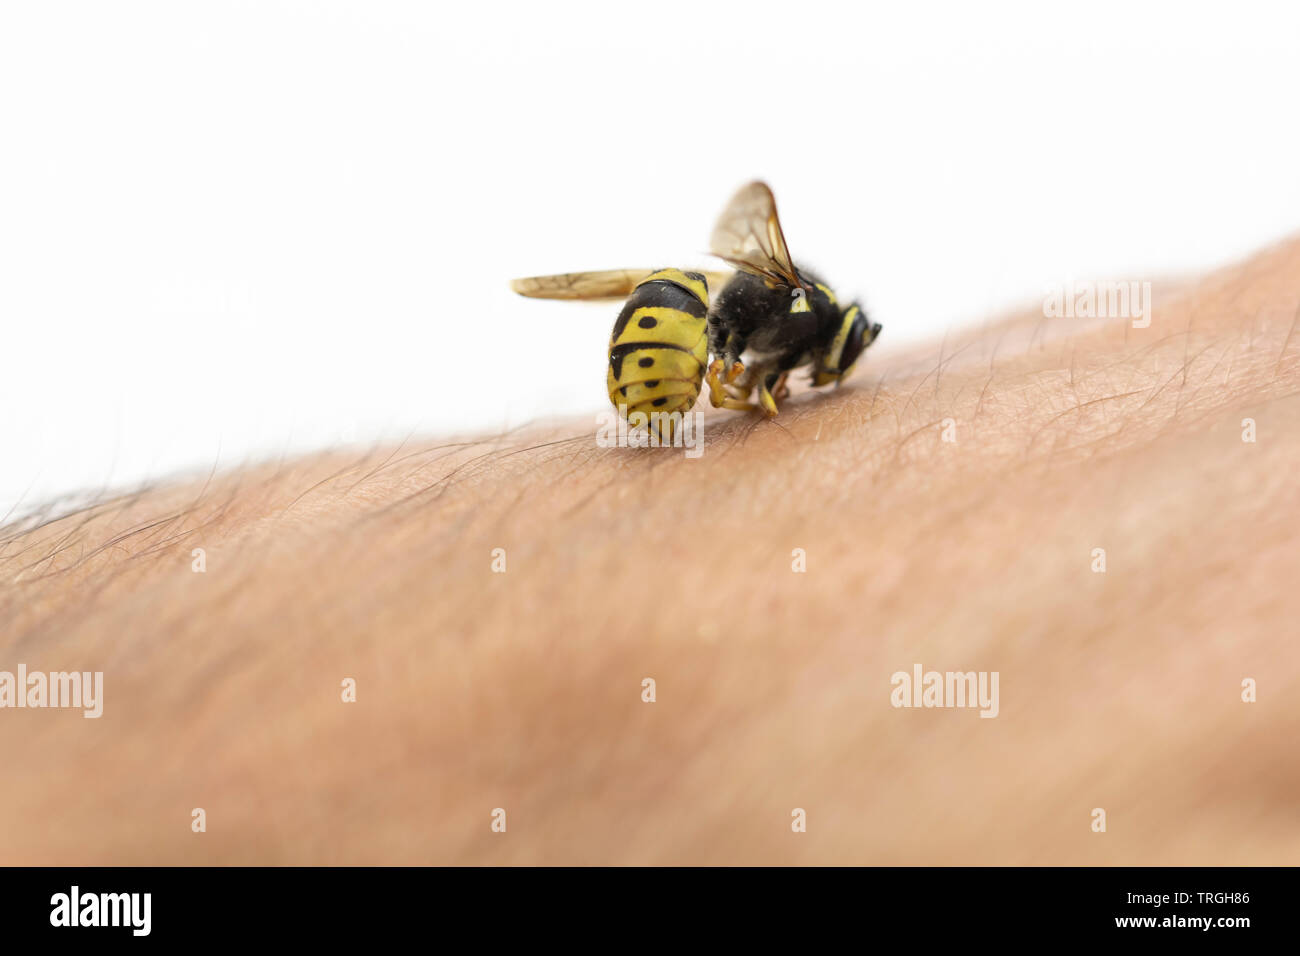 Punture d api nella pelle umana, macro shot Immagini Stock